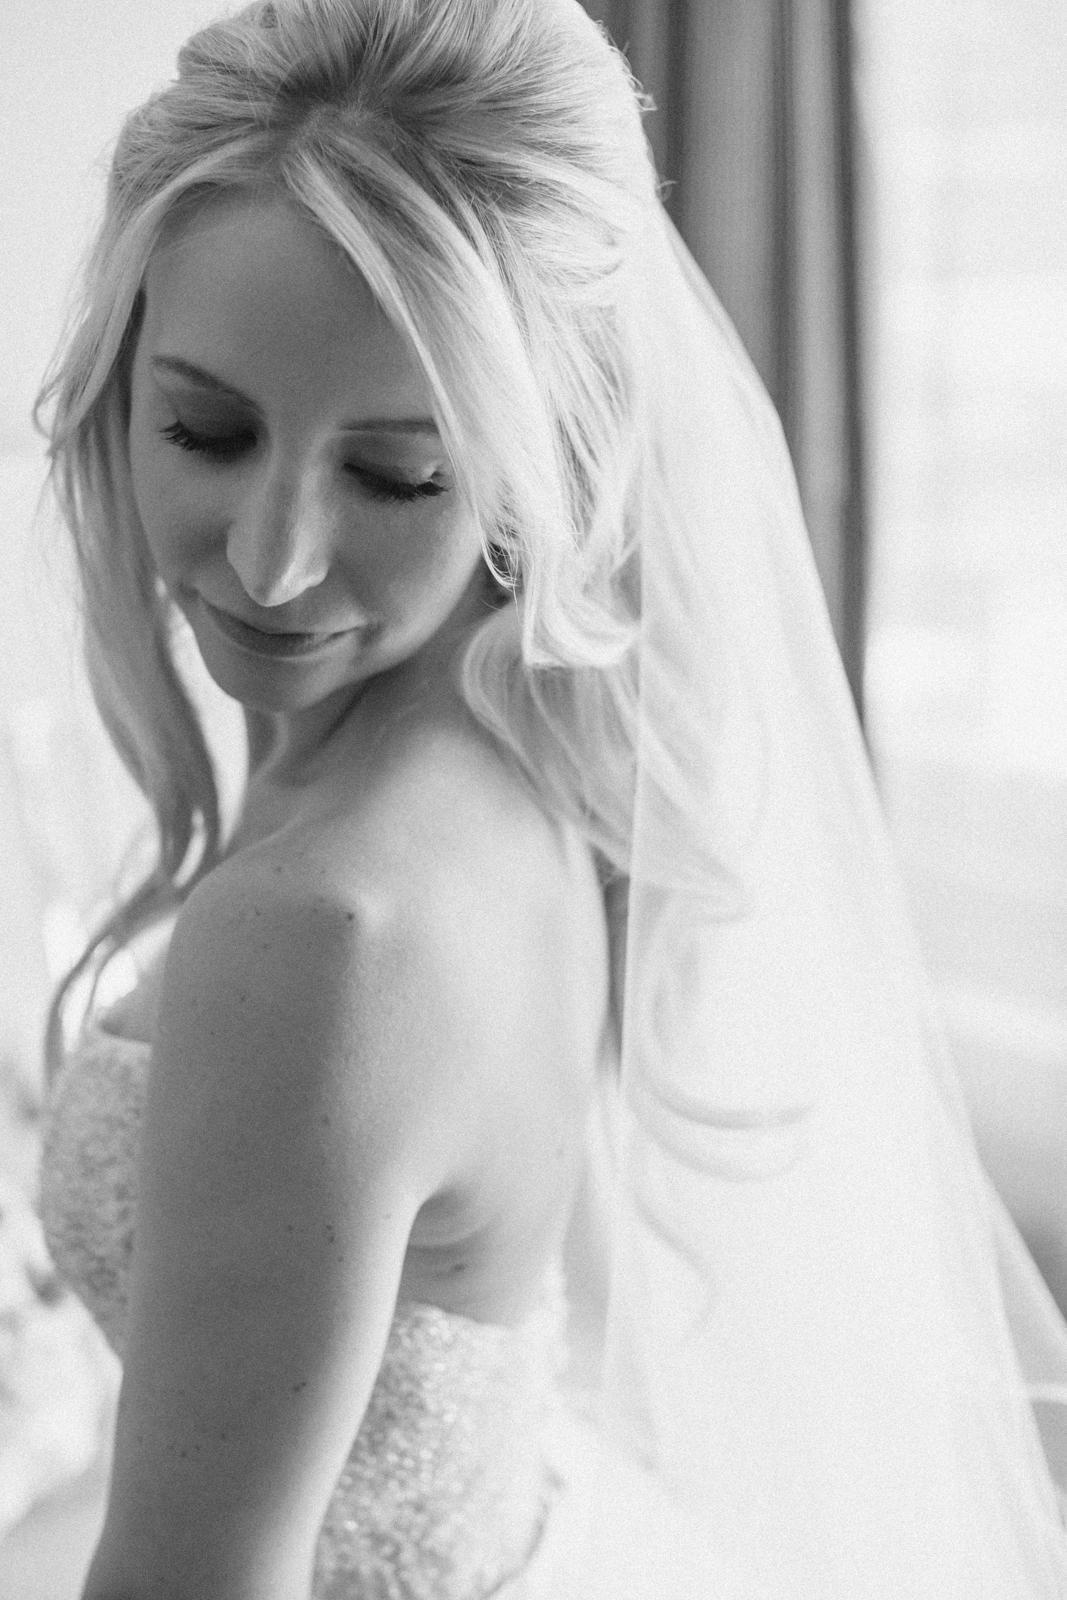 NYC Wedding Photography Sofitel Central Park Brooklyn Photographer Boris Zaretsky _B2C1920.jpg